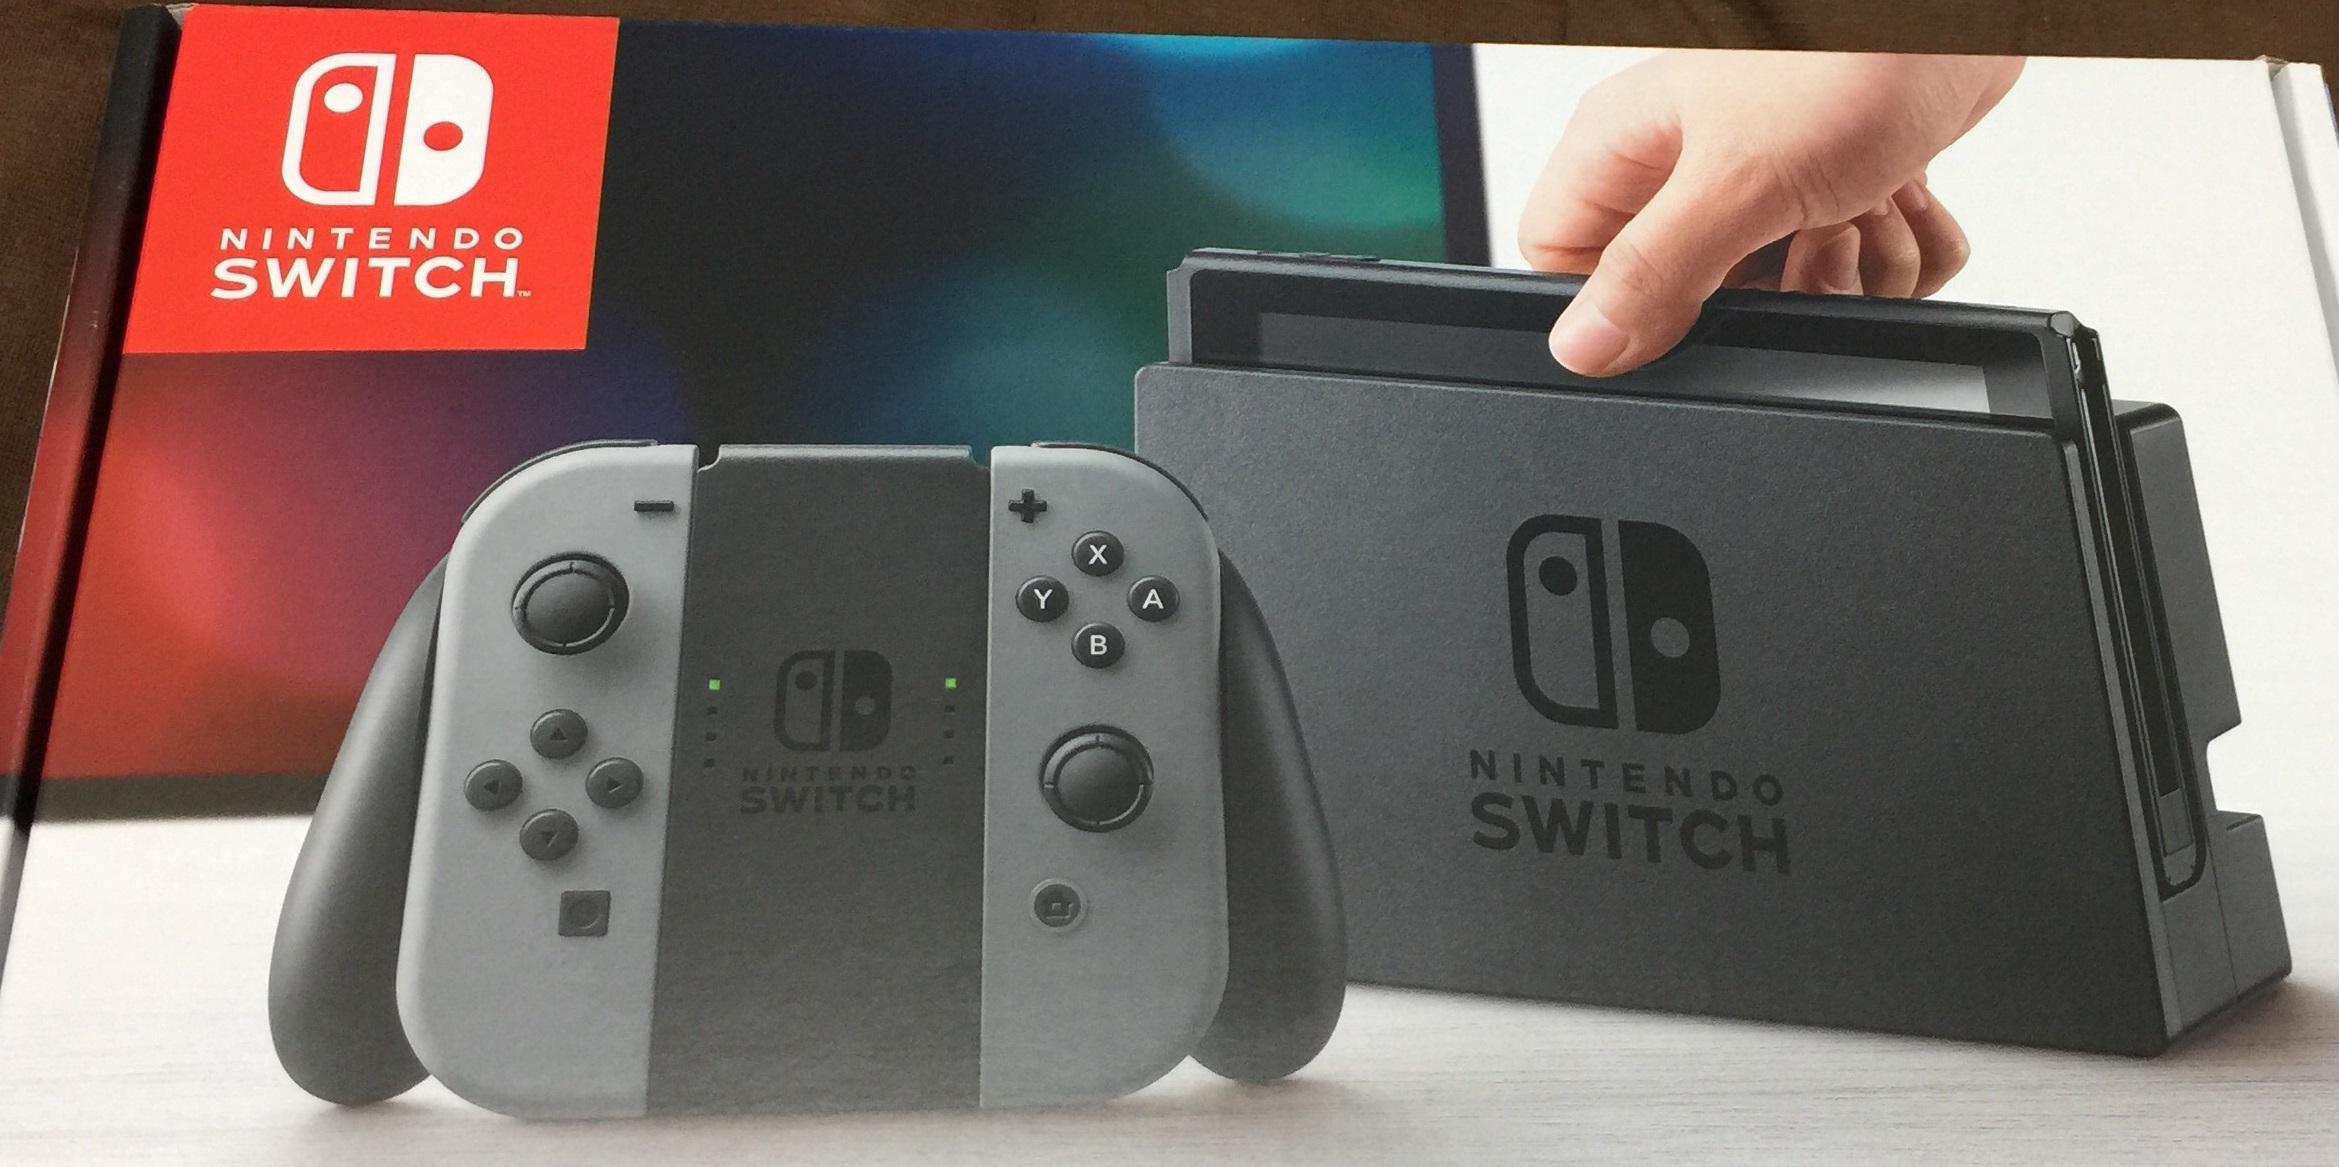 NintendoSwitchの箱